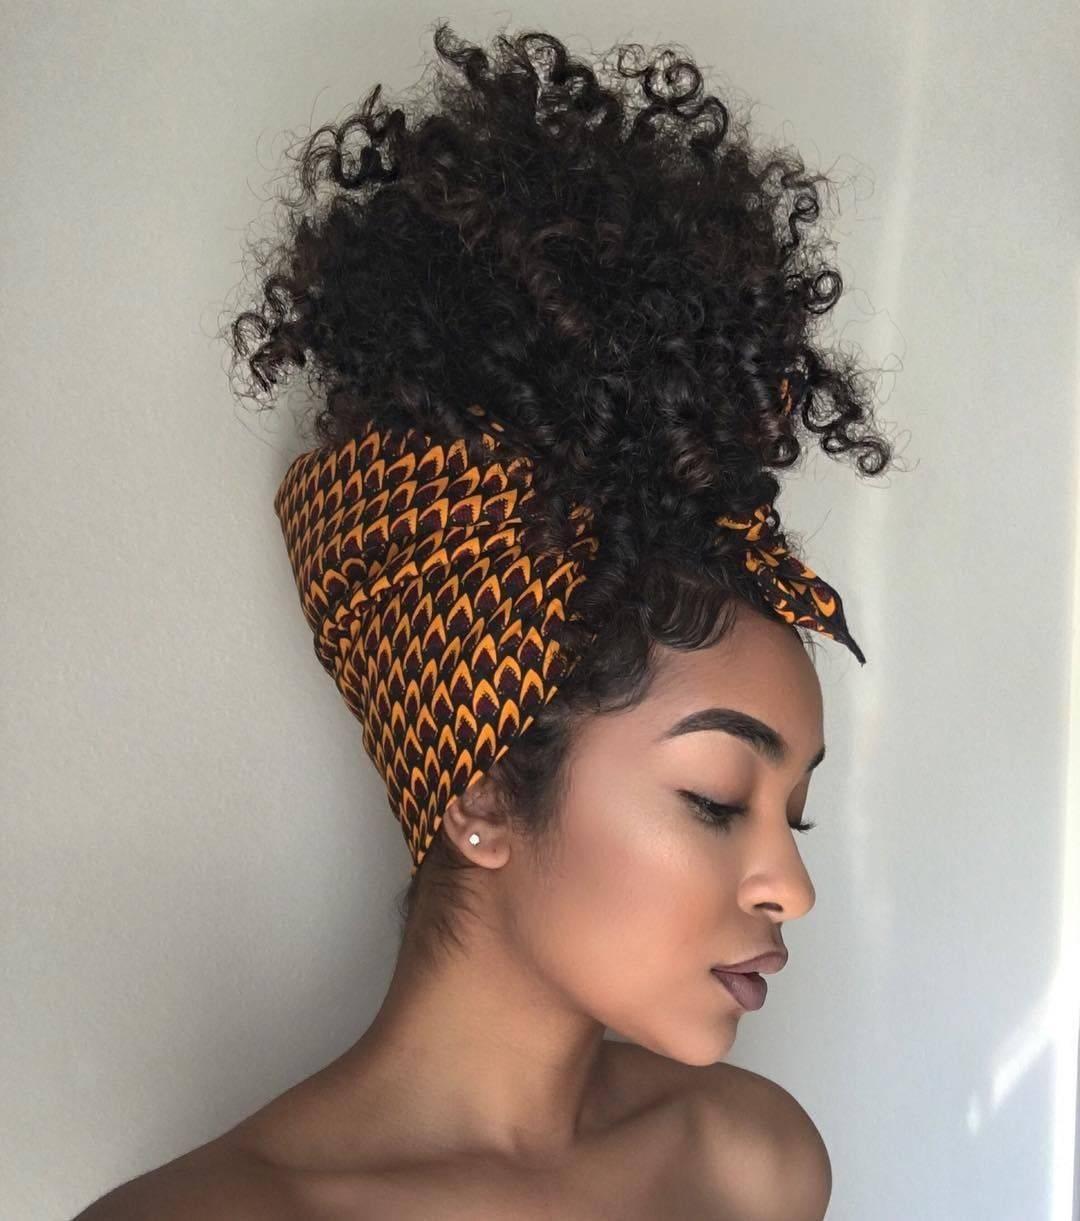 Accessorized Hair